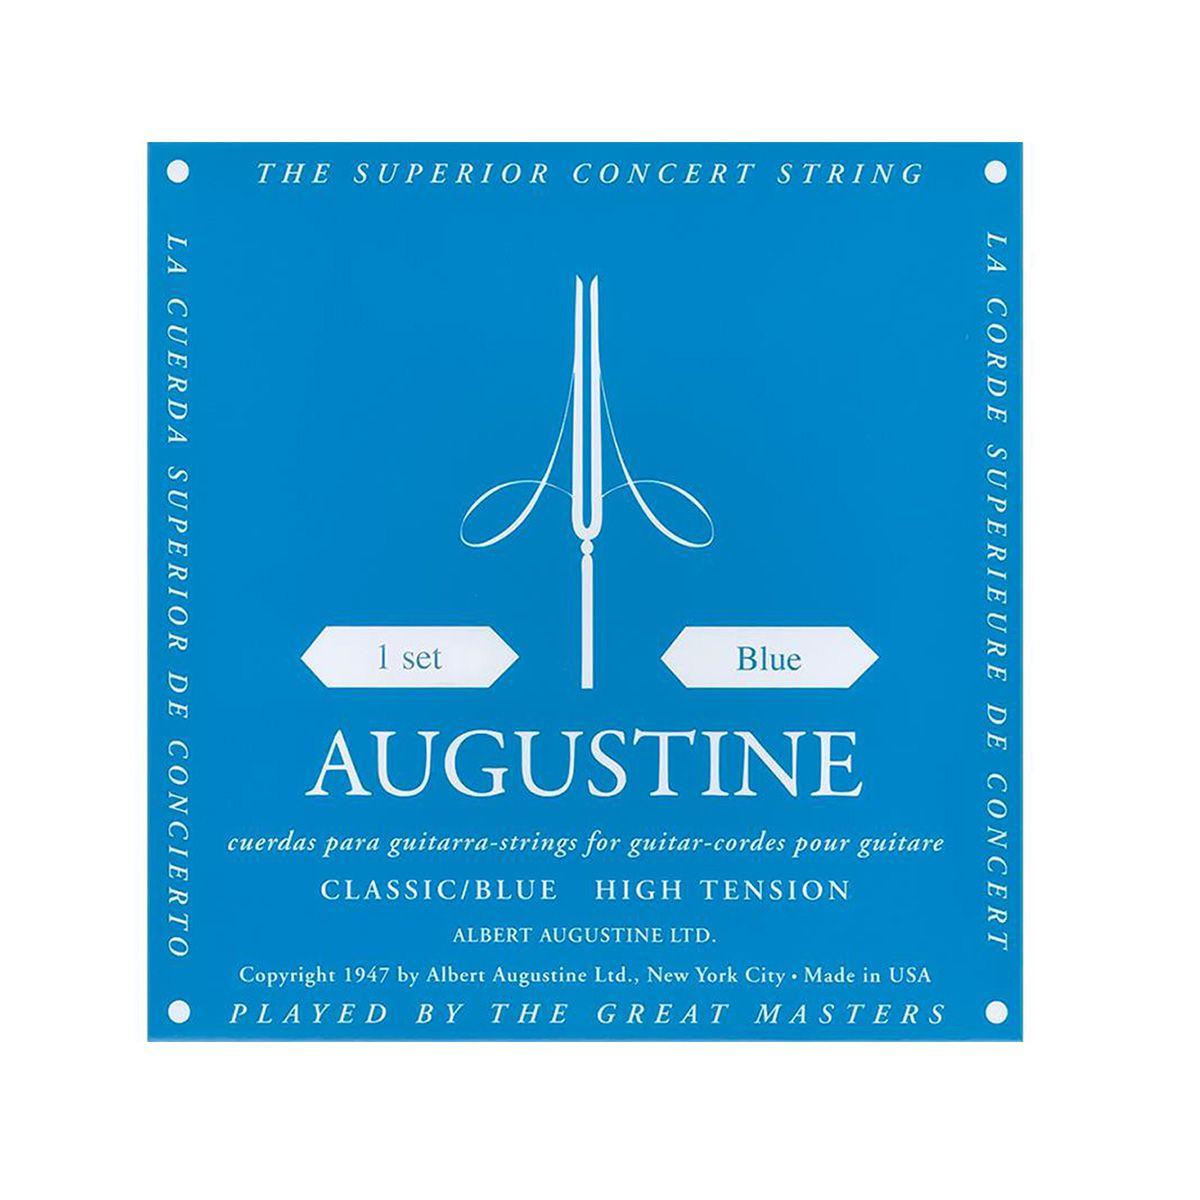 Encordoamento Augustine Classic/blue Tensão Alta Nylon